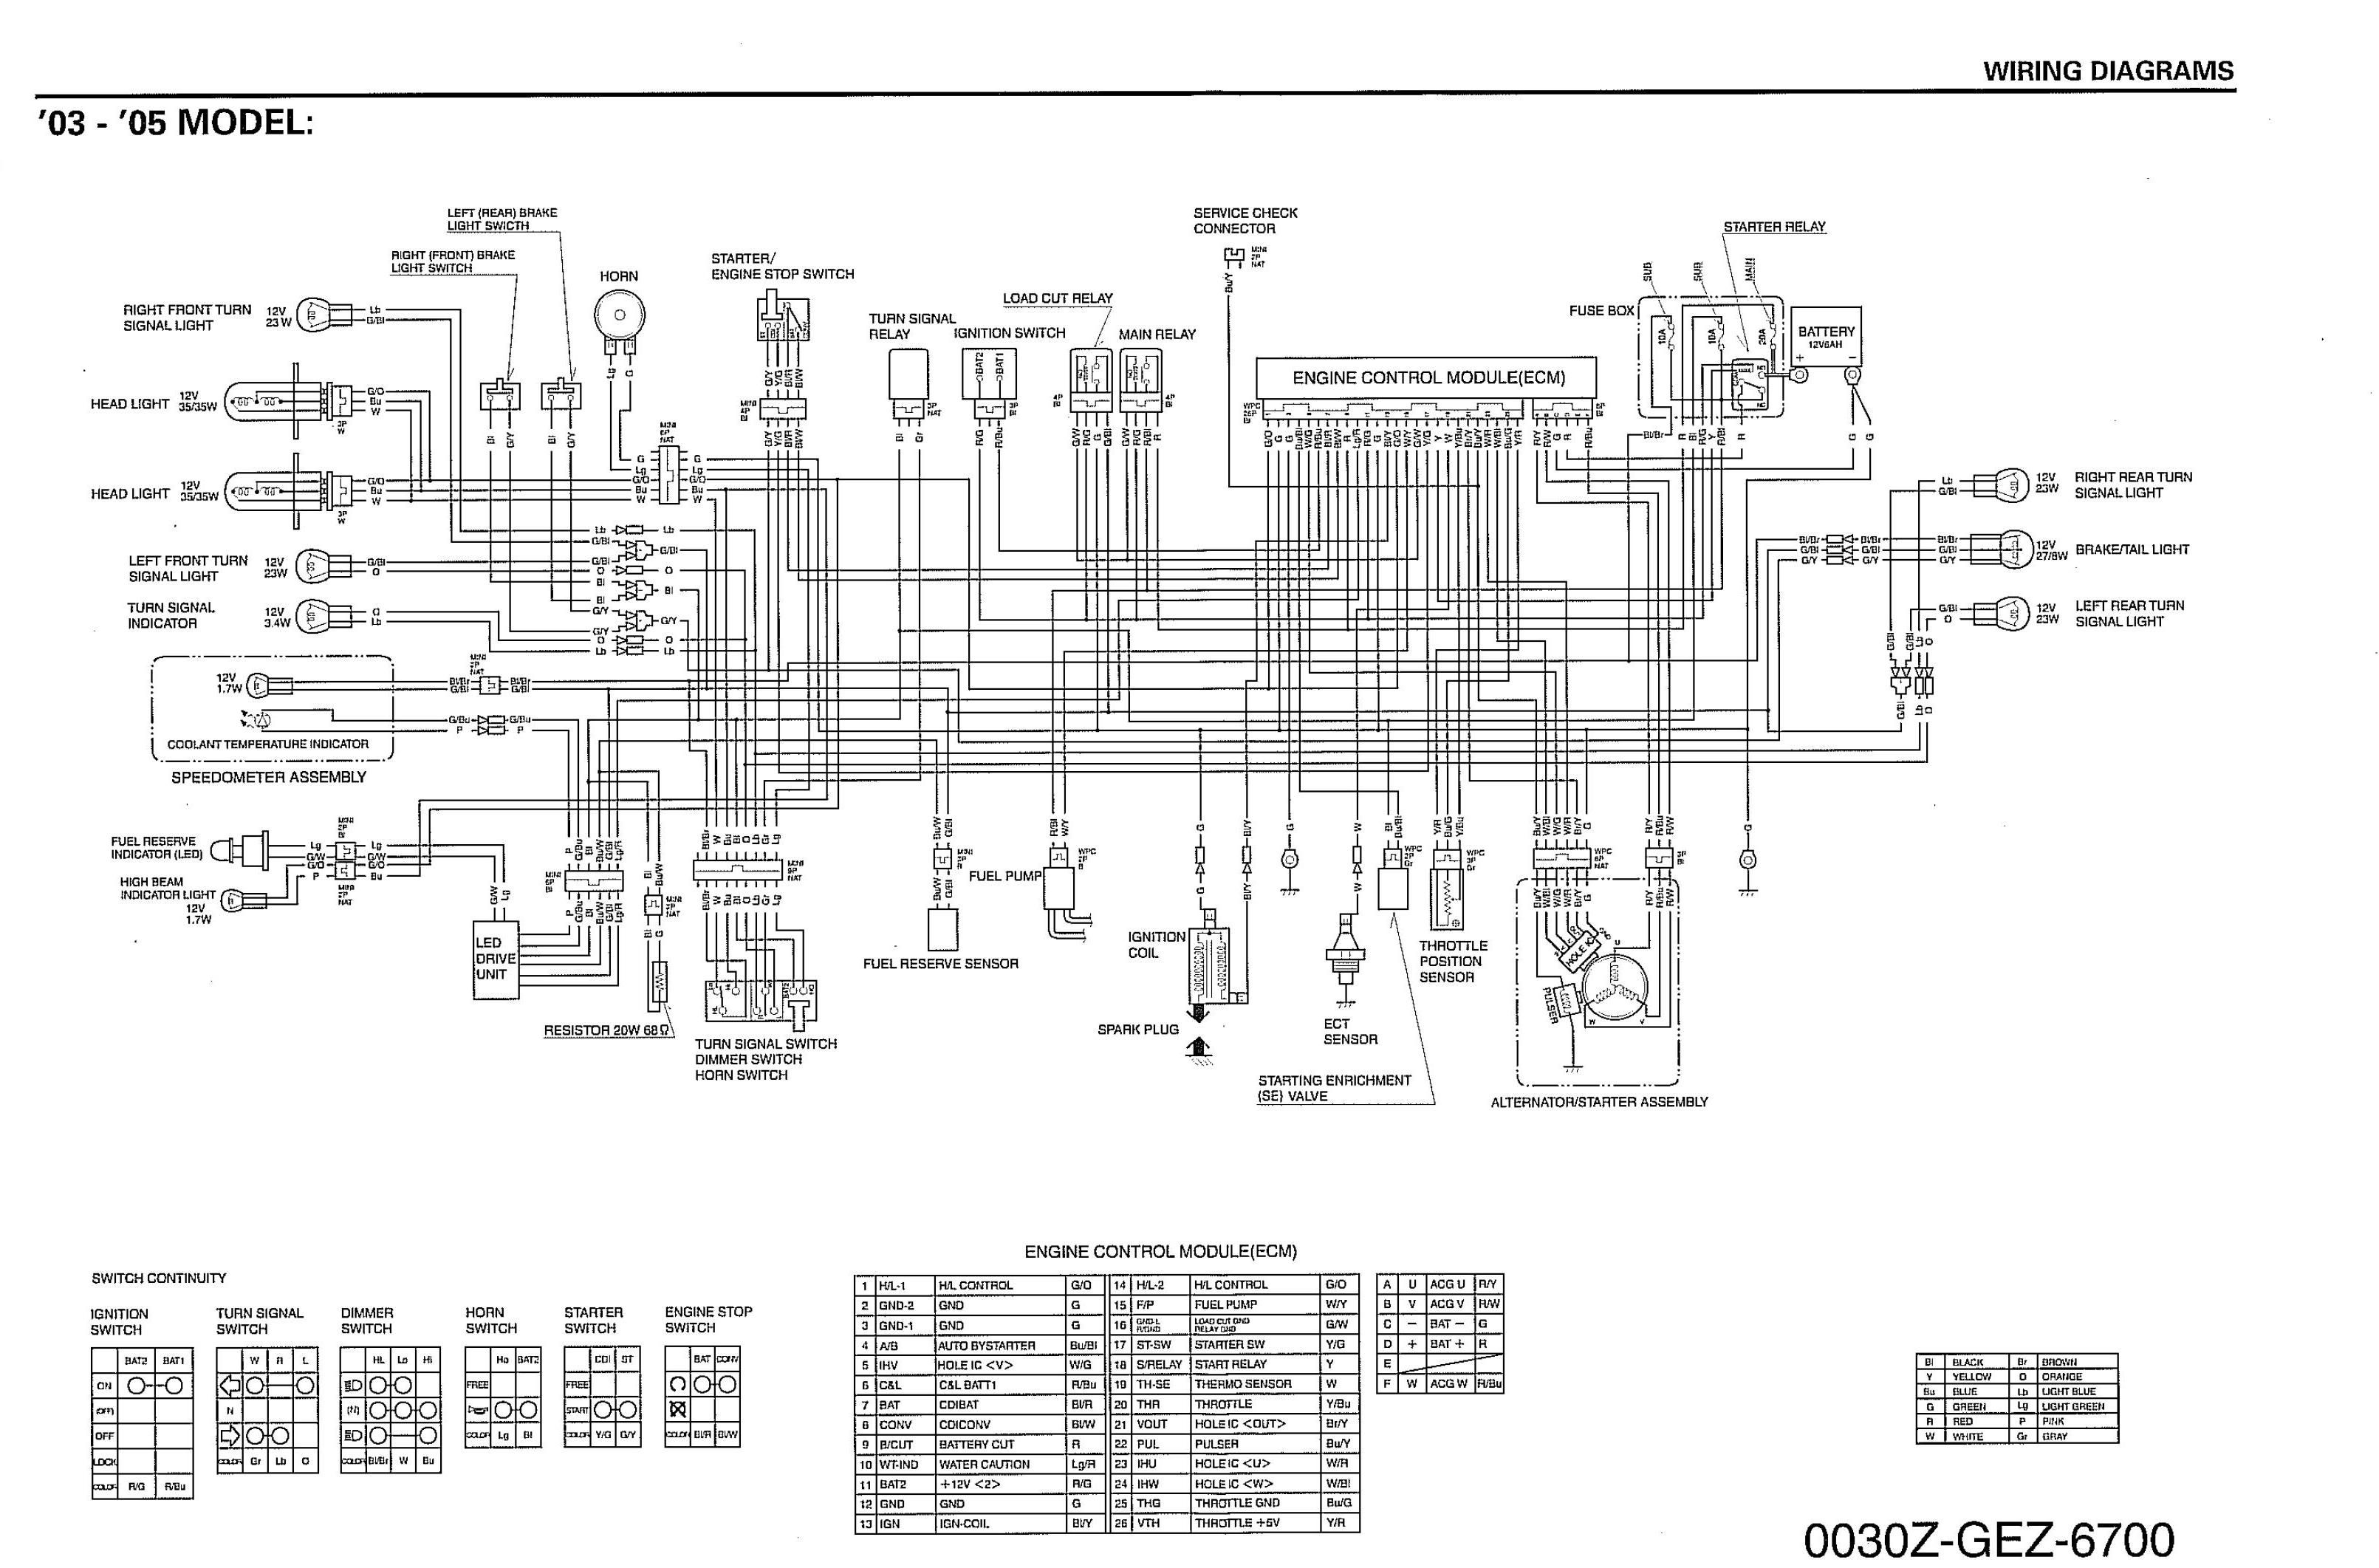 fuse box diagram for 2004 bmw x3